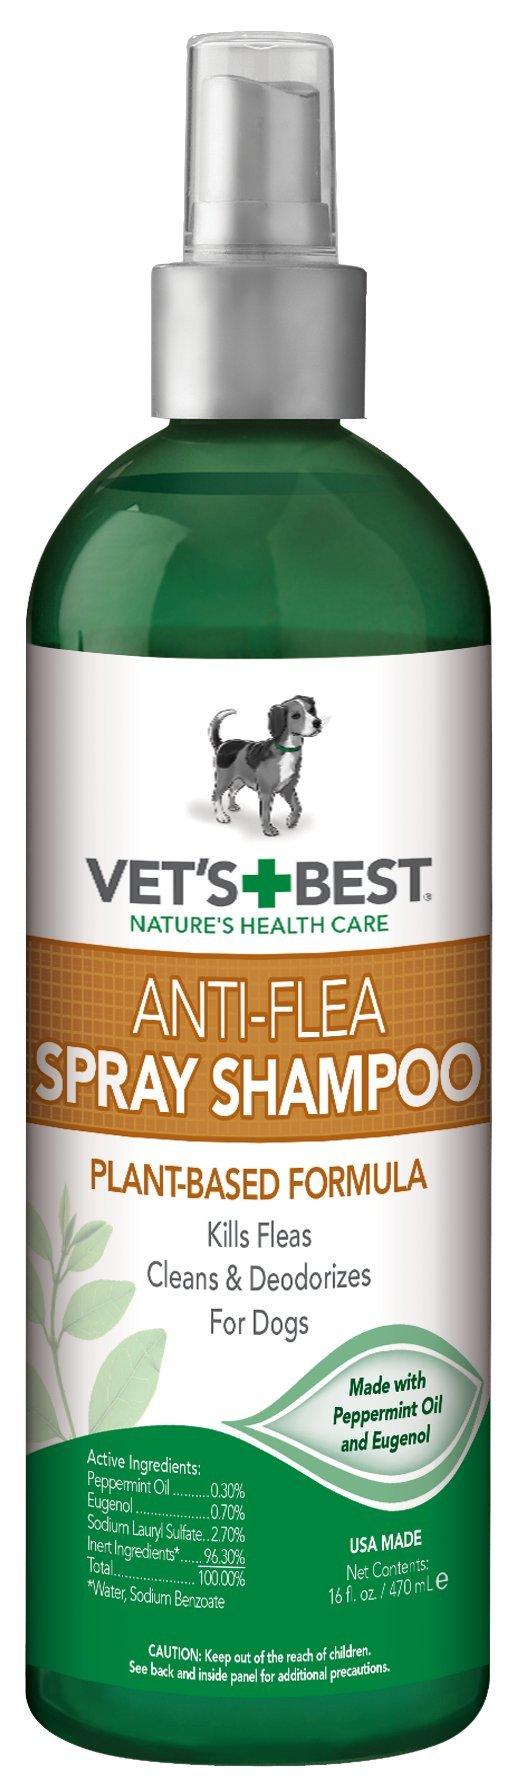 Anti-Flea Easy Spray Flea Shampoo for Pets